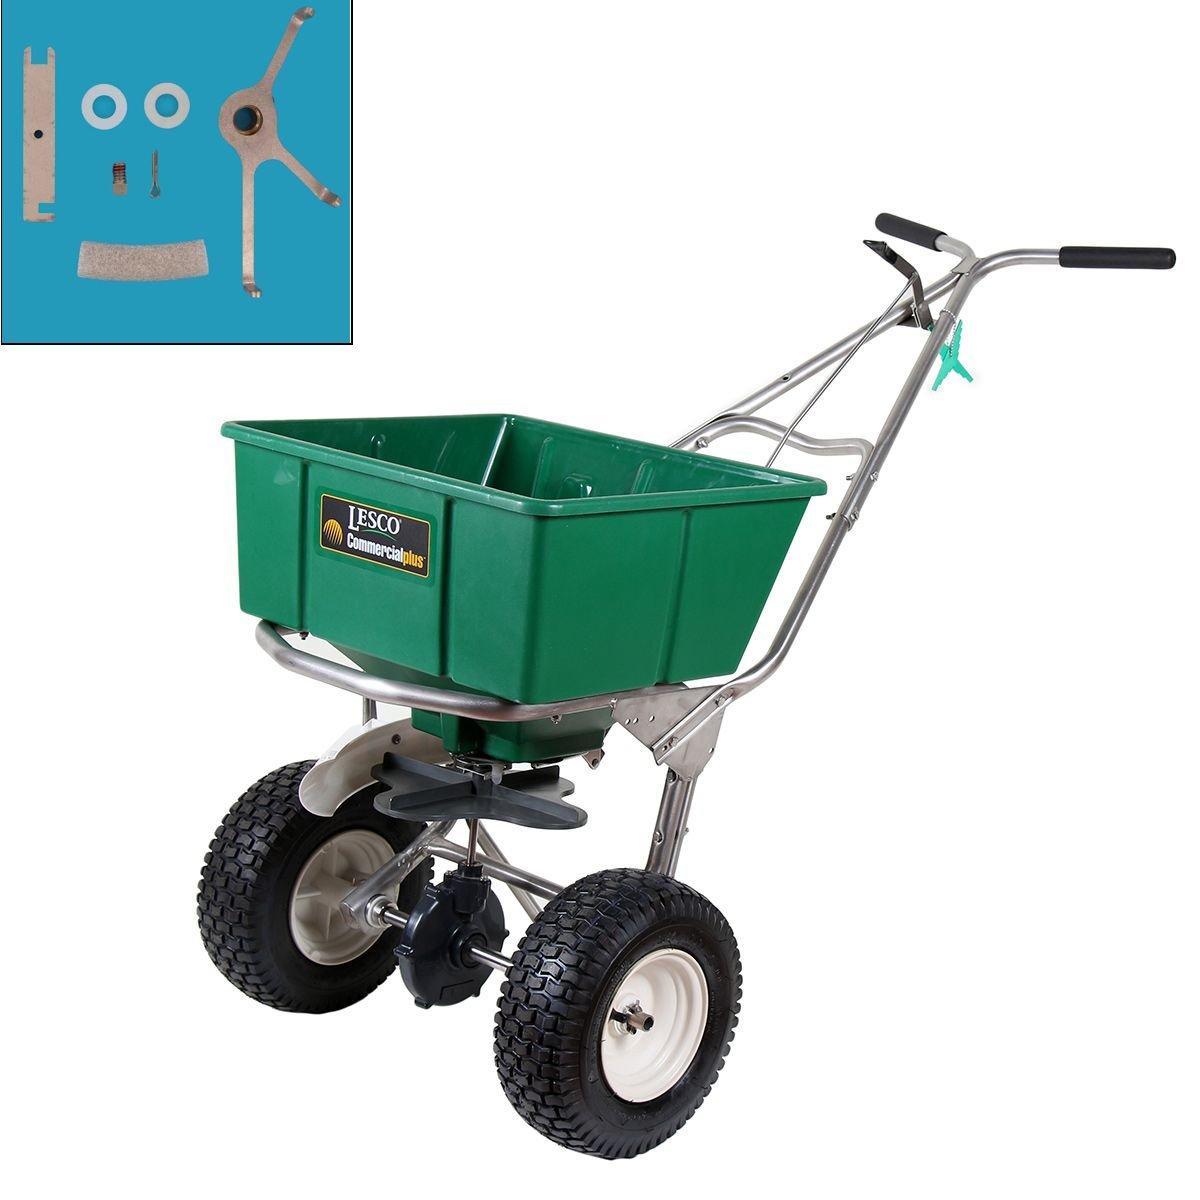 Bundle - 2 Items: Lesco 101186 High Wheel Walk-Behind Fertilizer Spreader with T422400 BreakThru Agitator Kit by Lesco